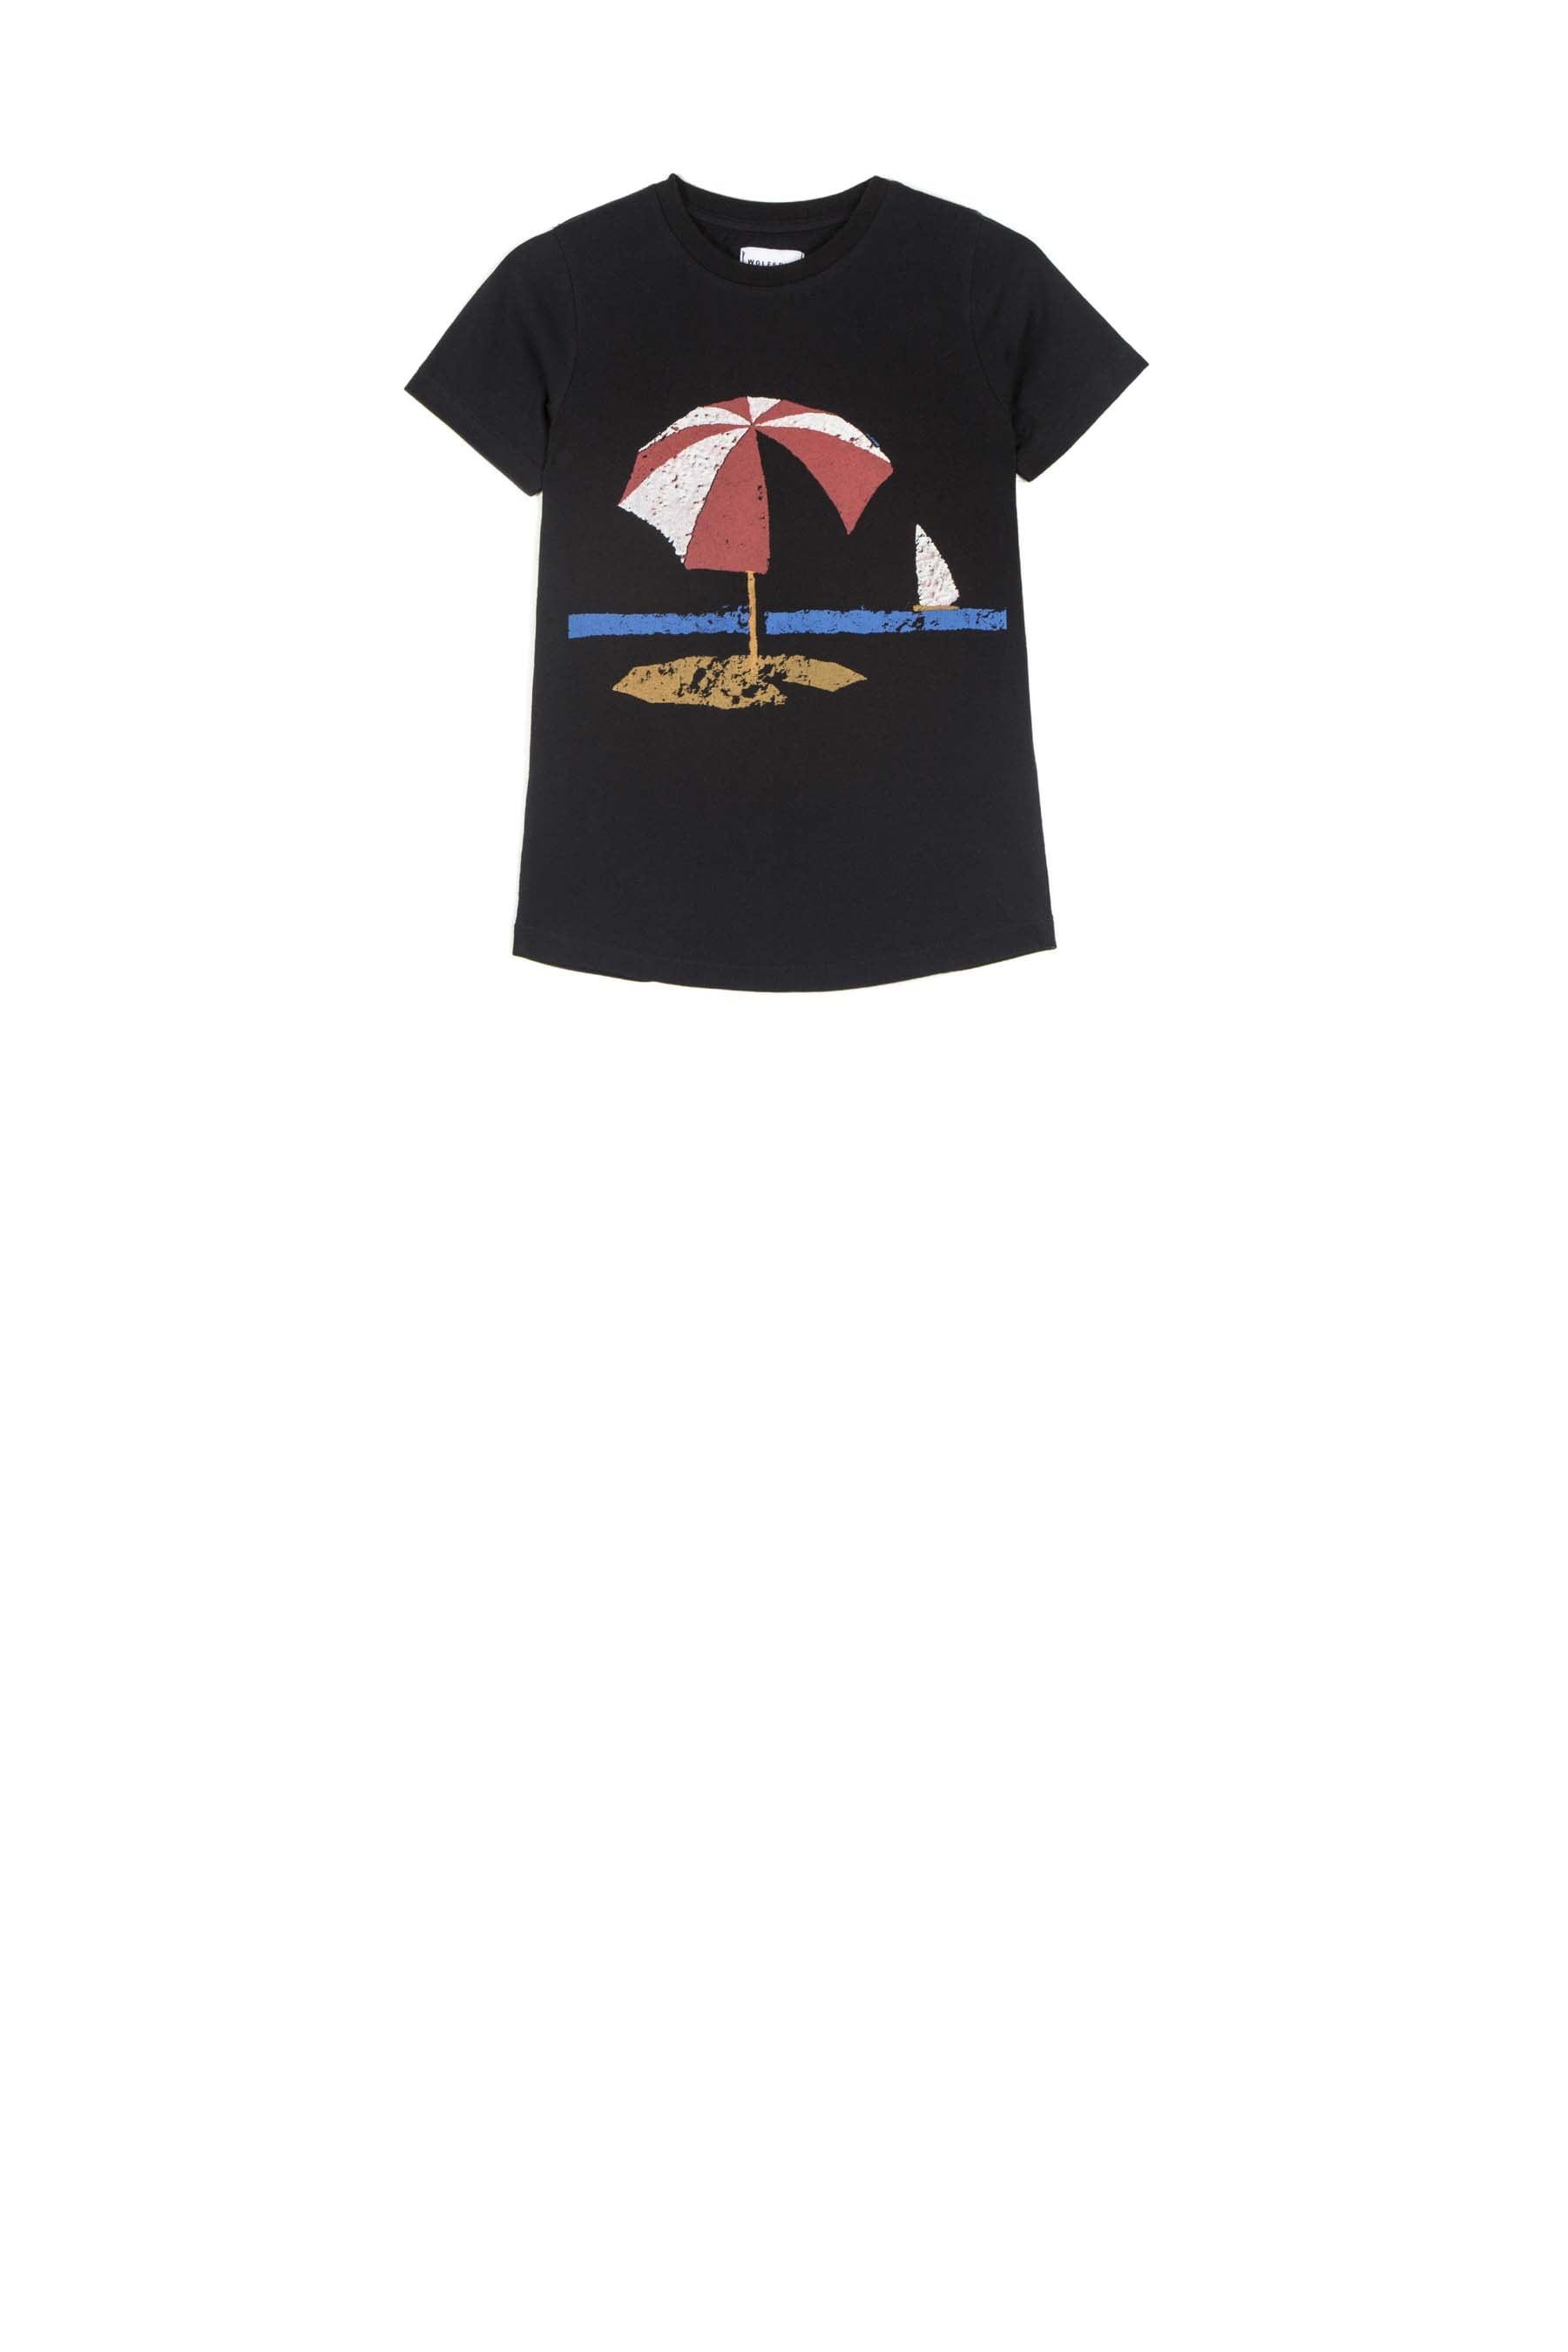 wolf rita sebastiao t shirt parasol